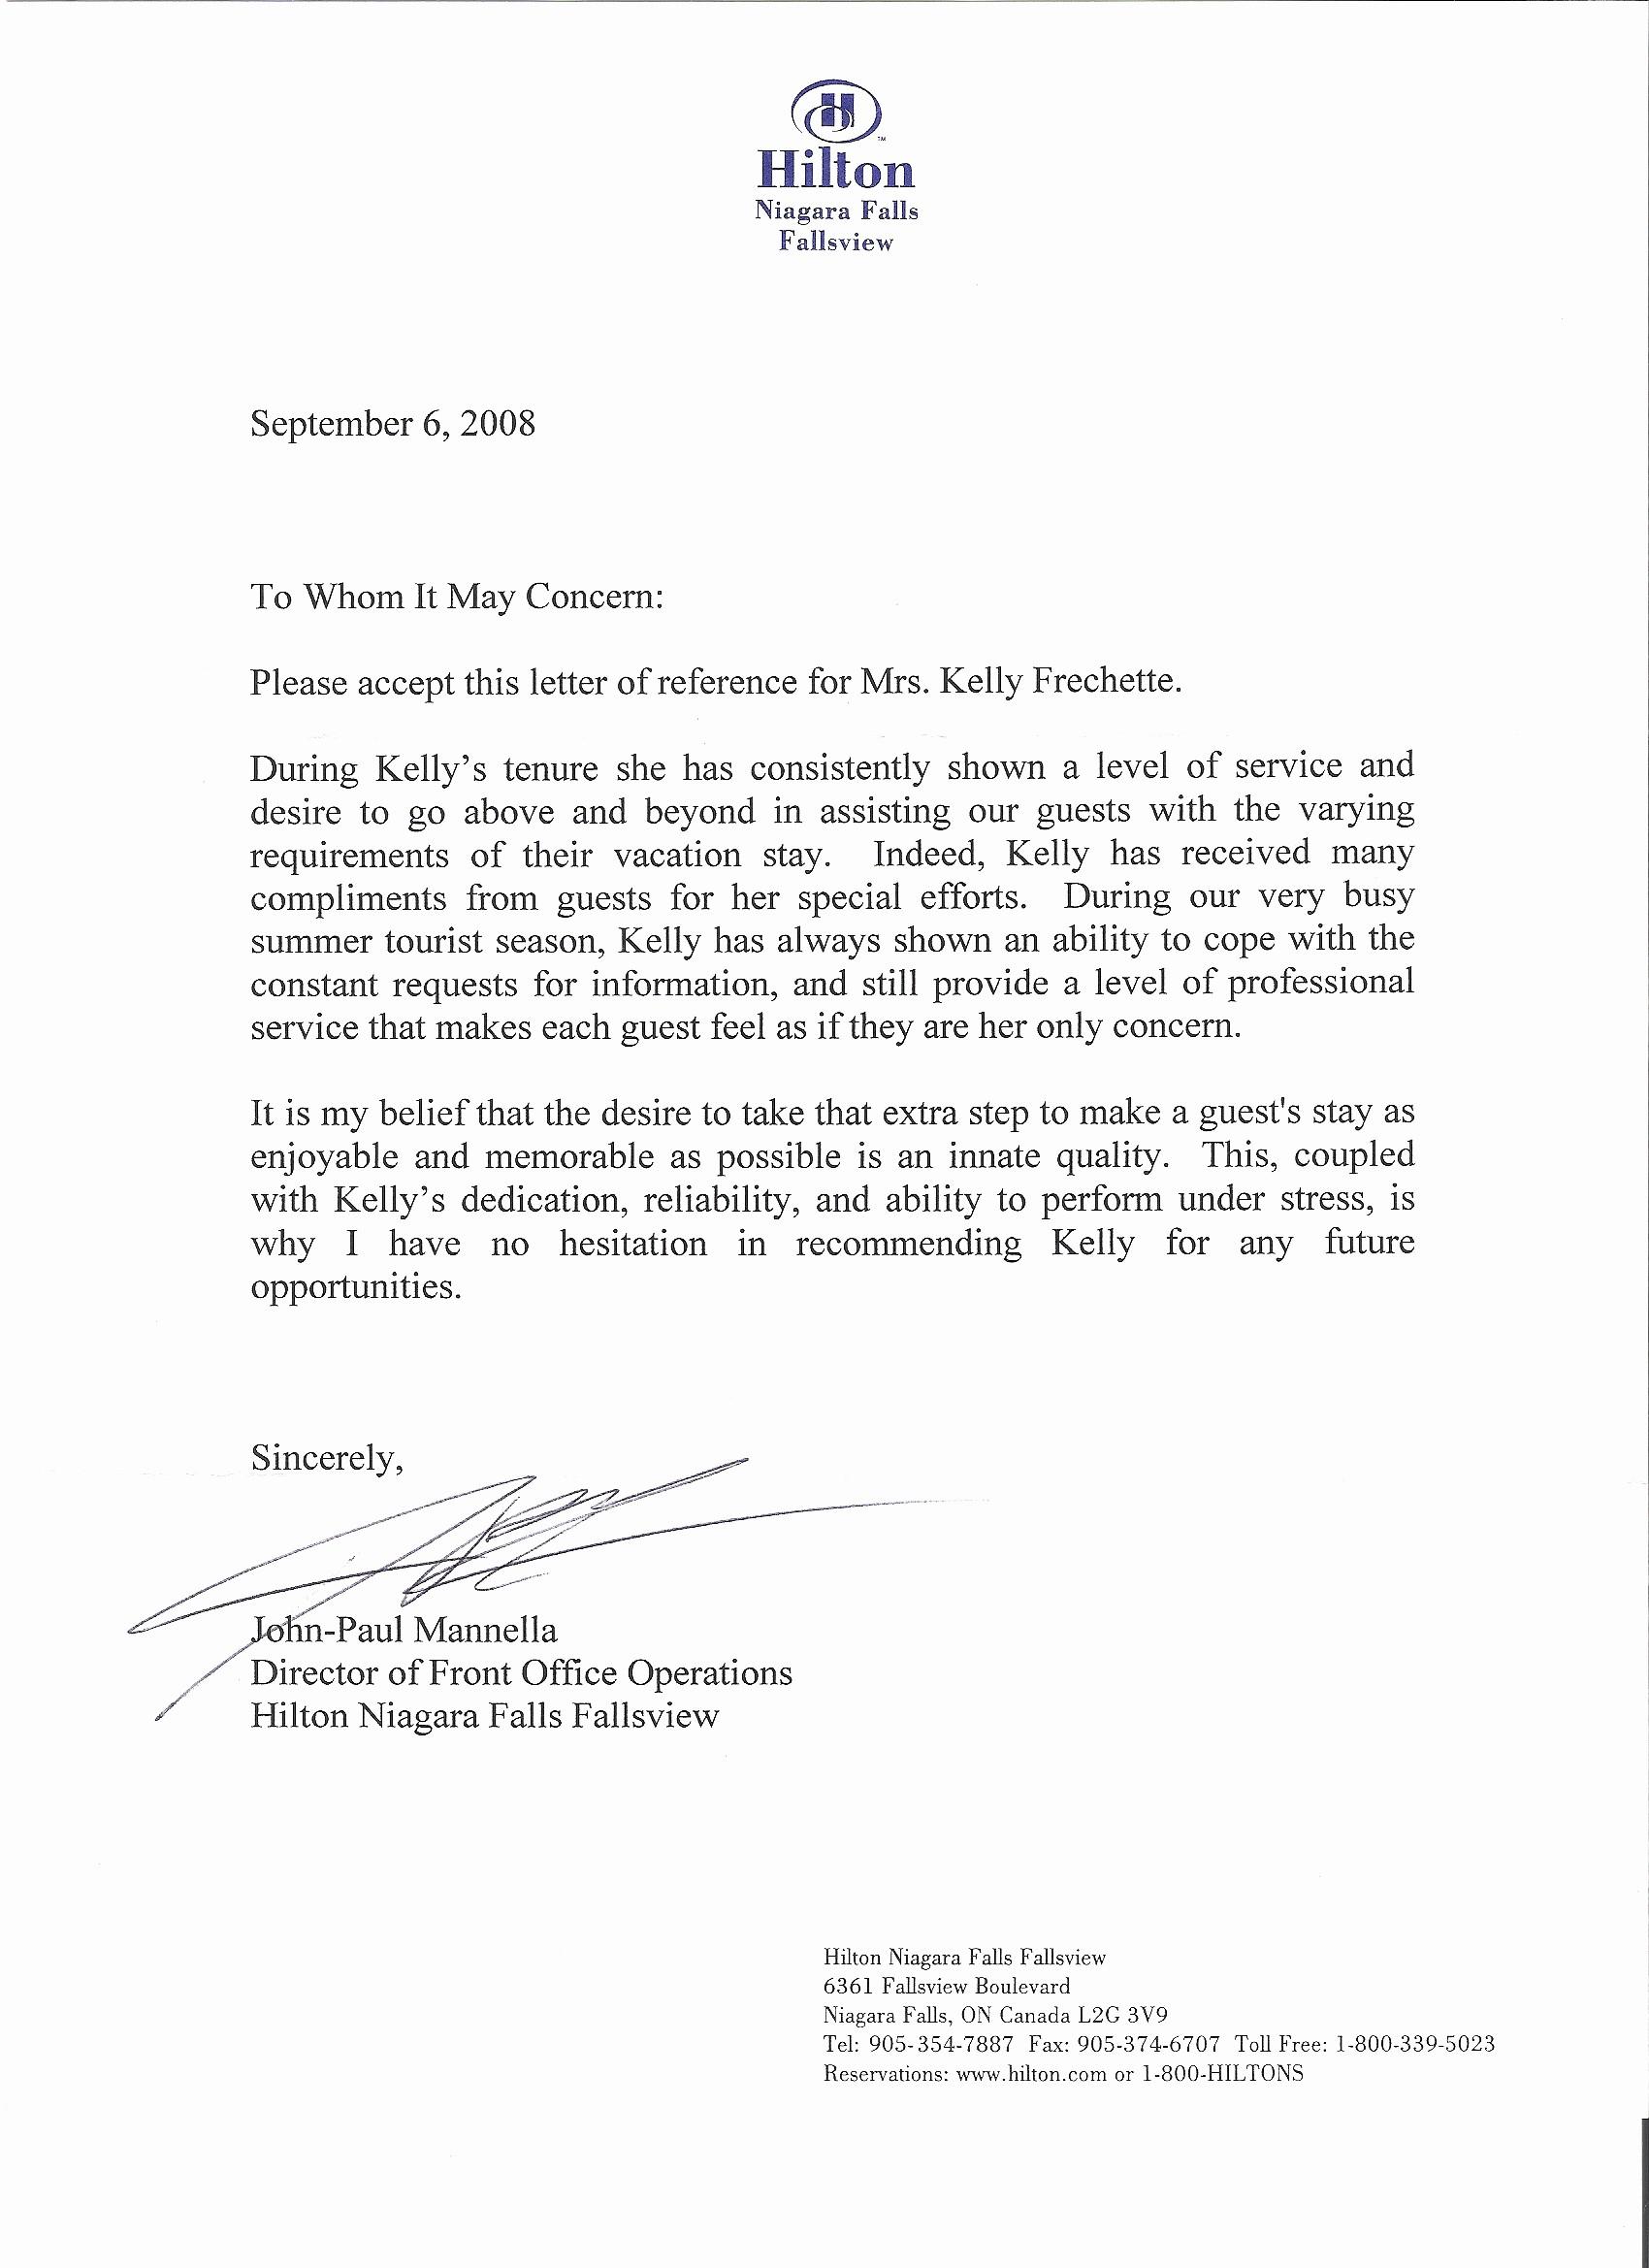 Sample Of Employee Reference Letter Elegant Writing A Reference Letter Example Samplebusinessresume